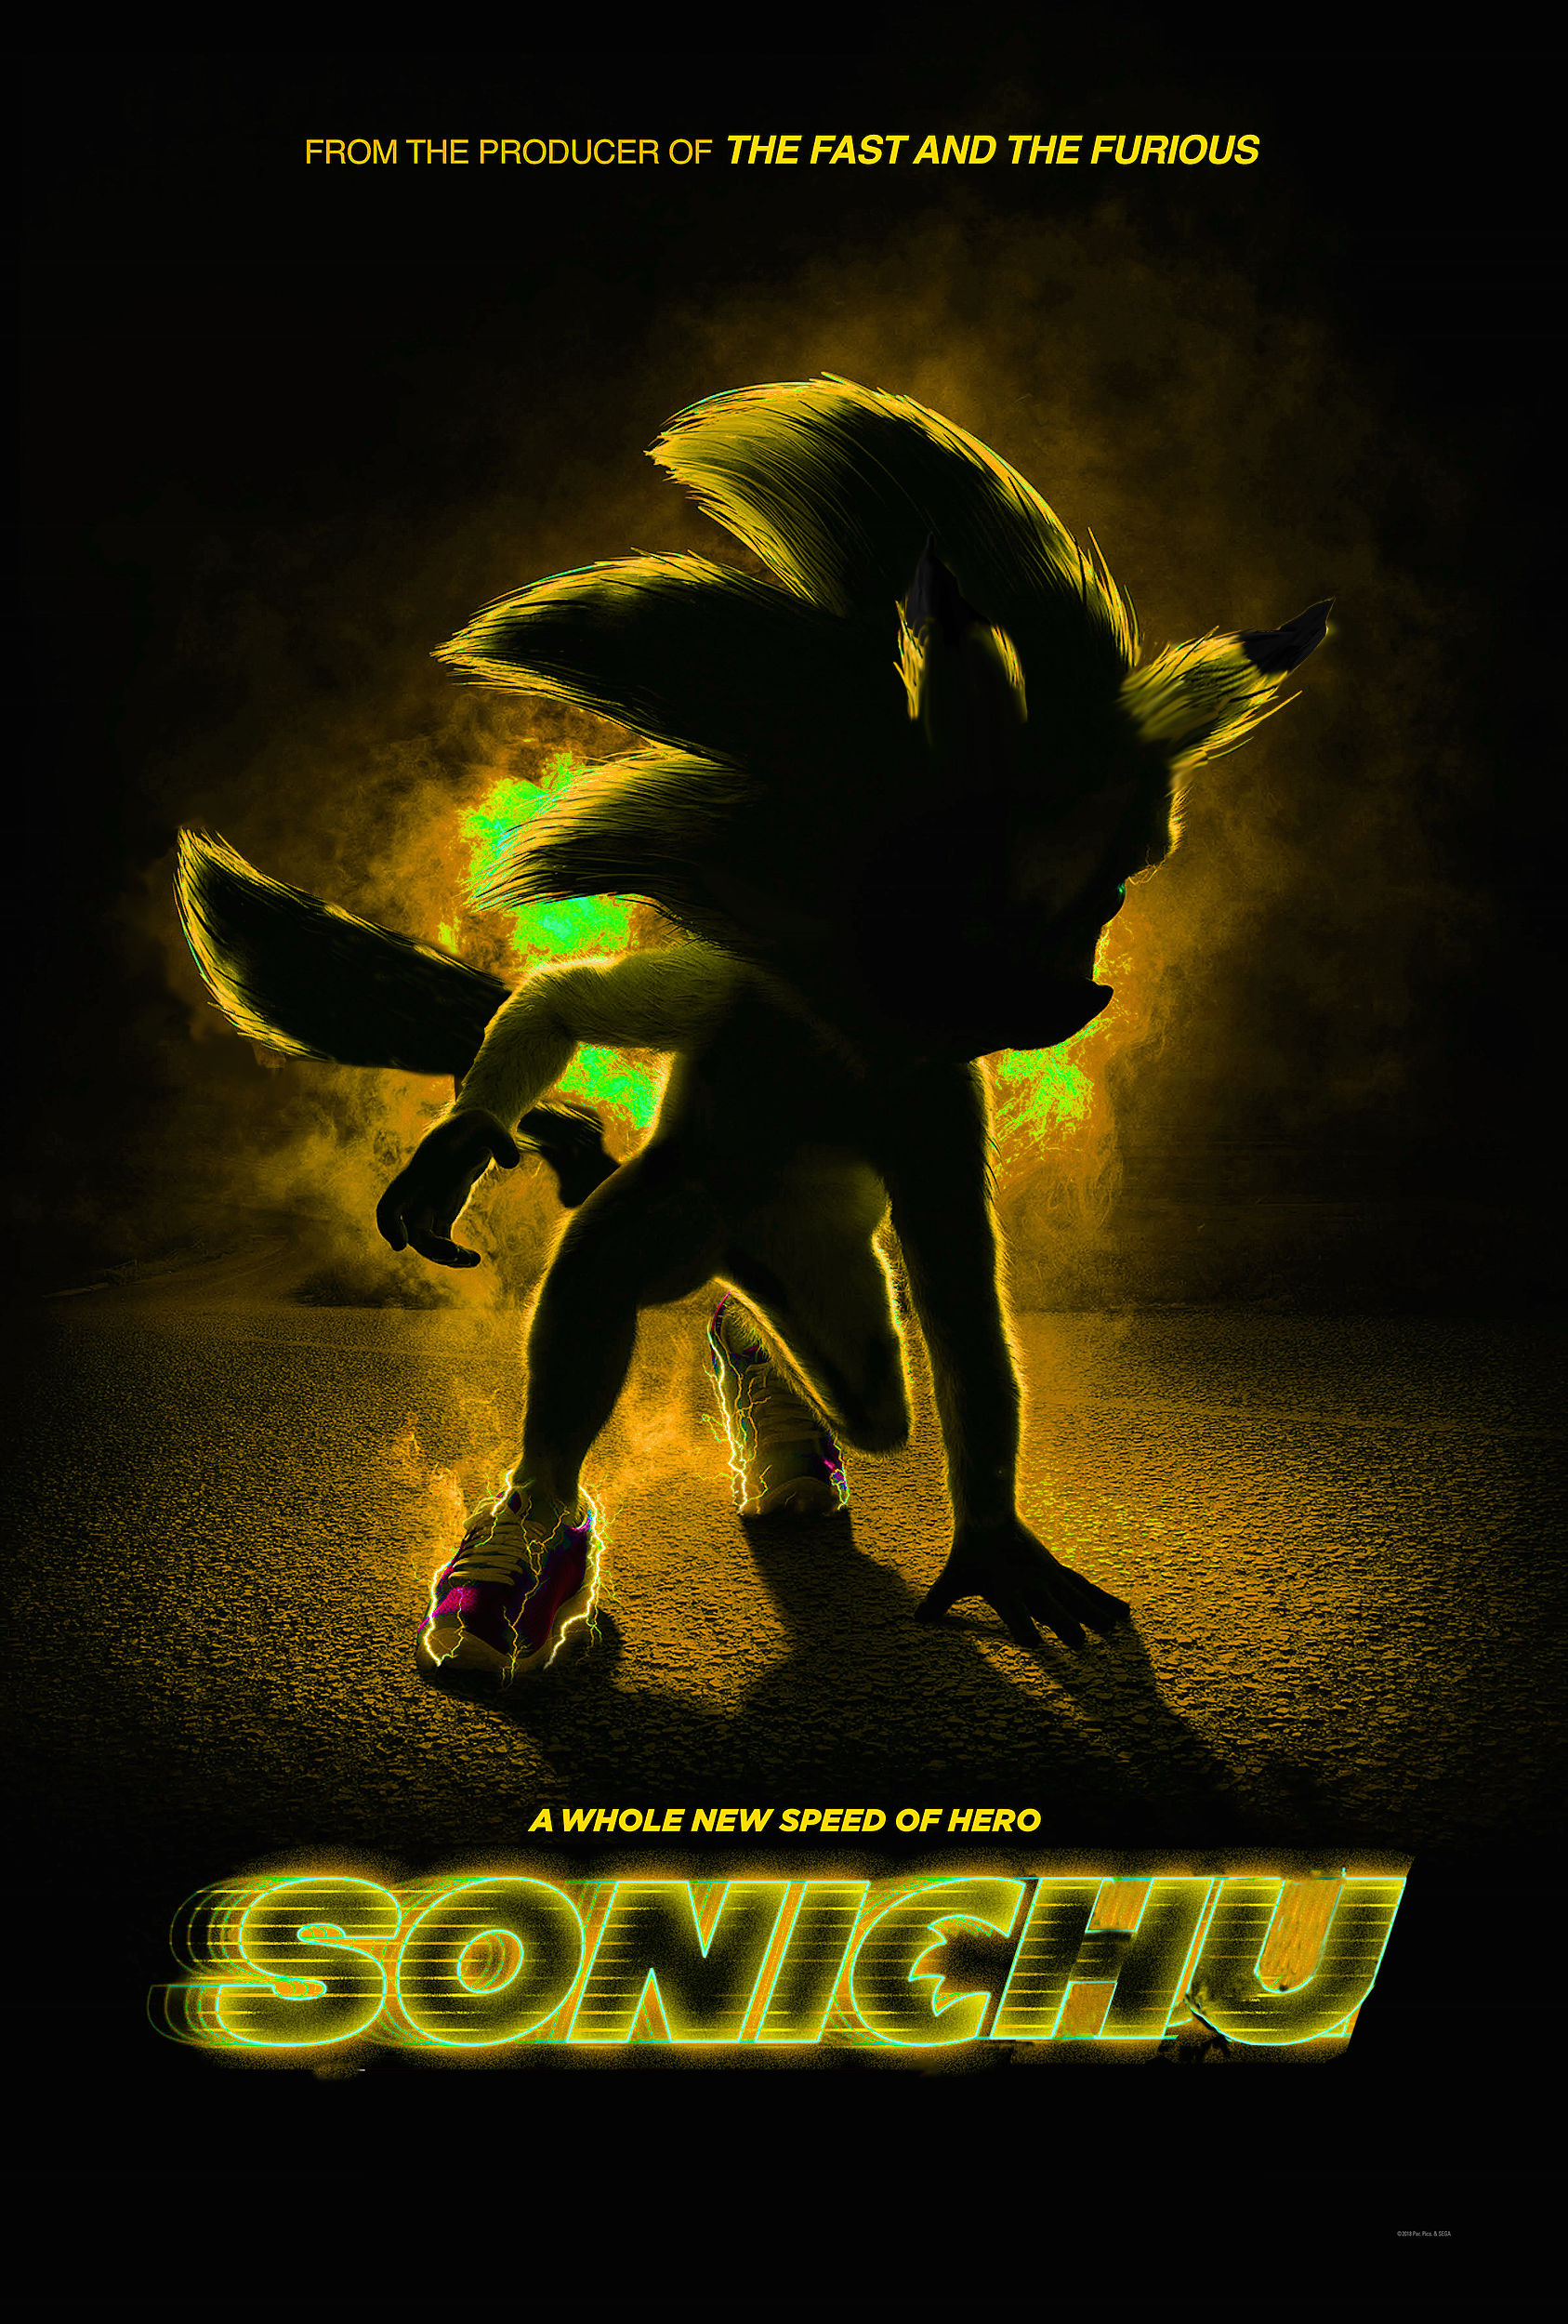 Sonichu The Movie Sonic The Hedgehog Movie Poster Parodies Know